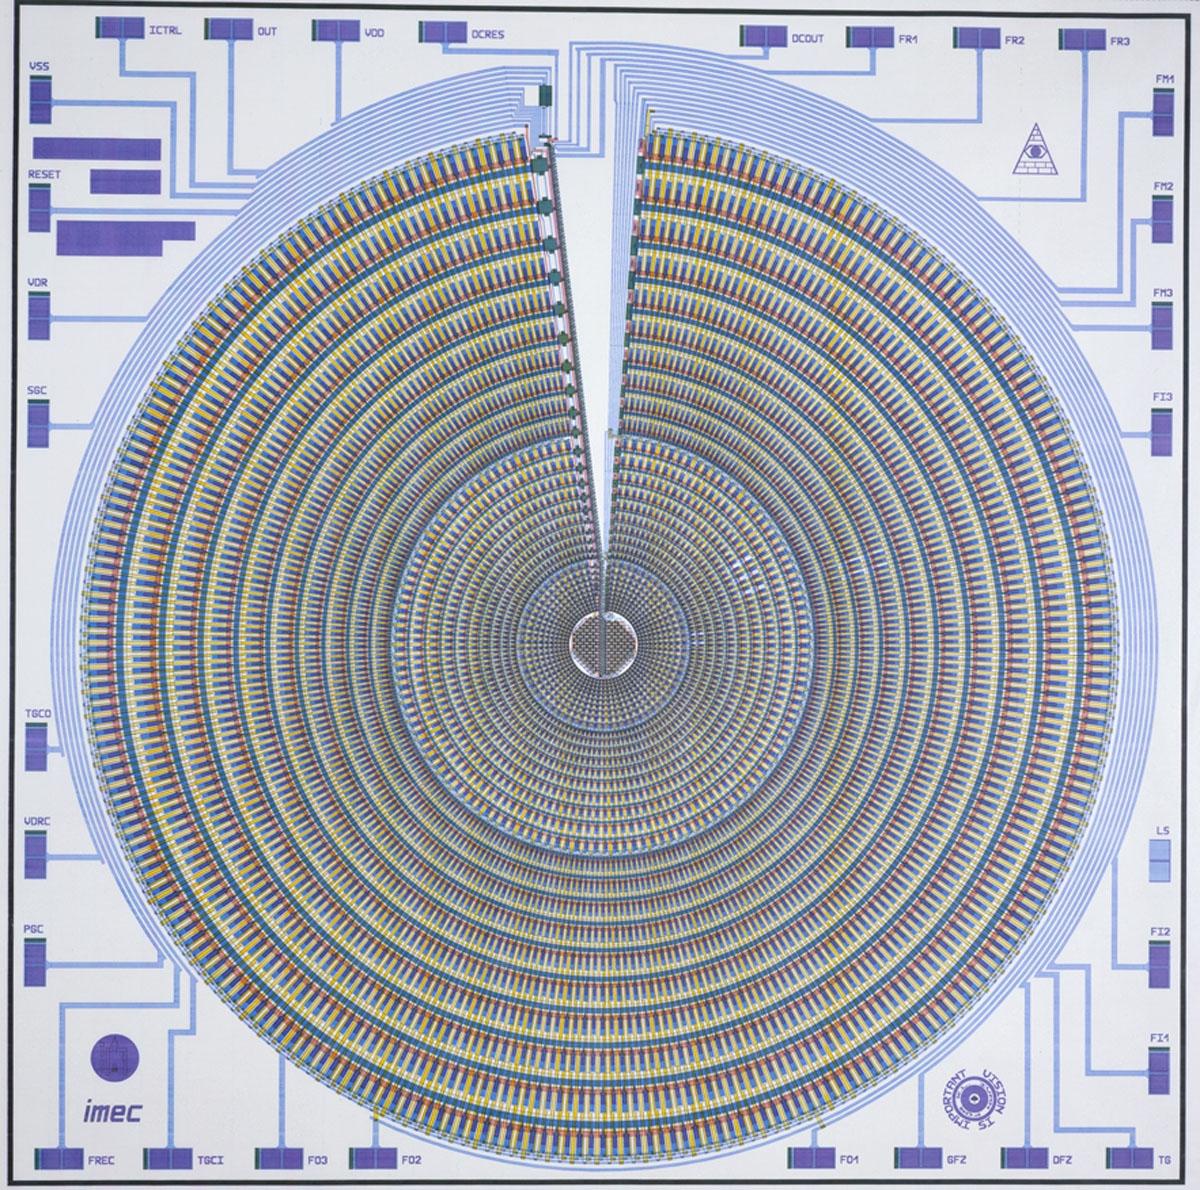 sony ccd wiring diagram wiring diagram blogs sony mex n4100bt wiring diagram sony ccd wiring diagram [ 1200 x 1190 Pixel ]